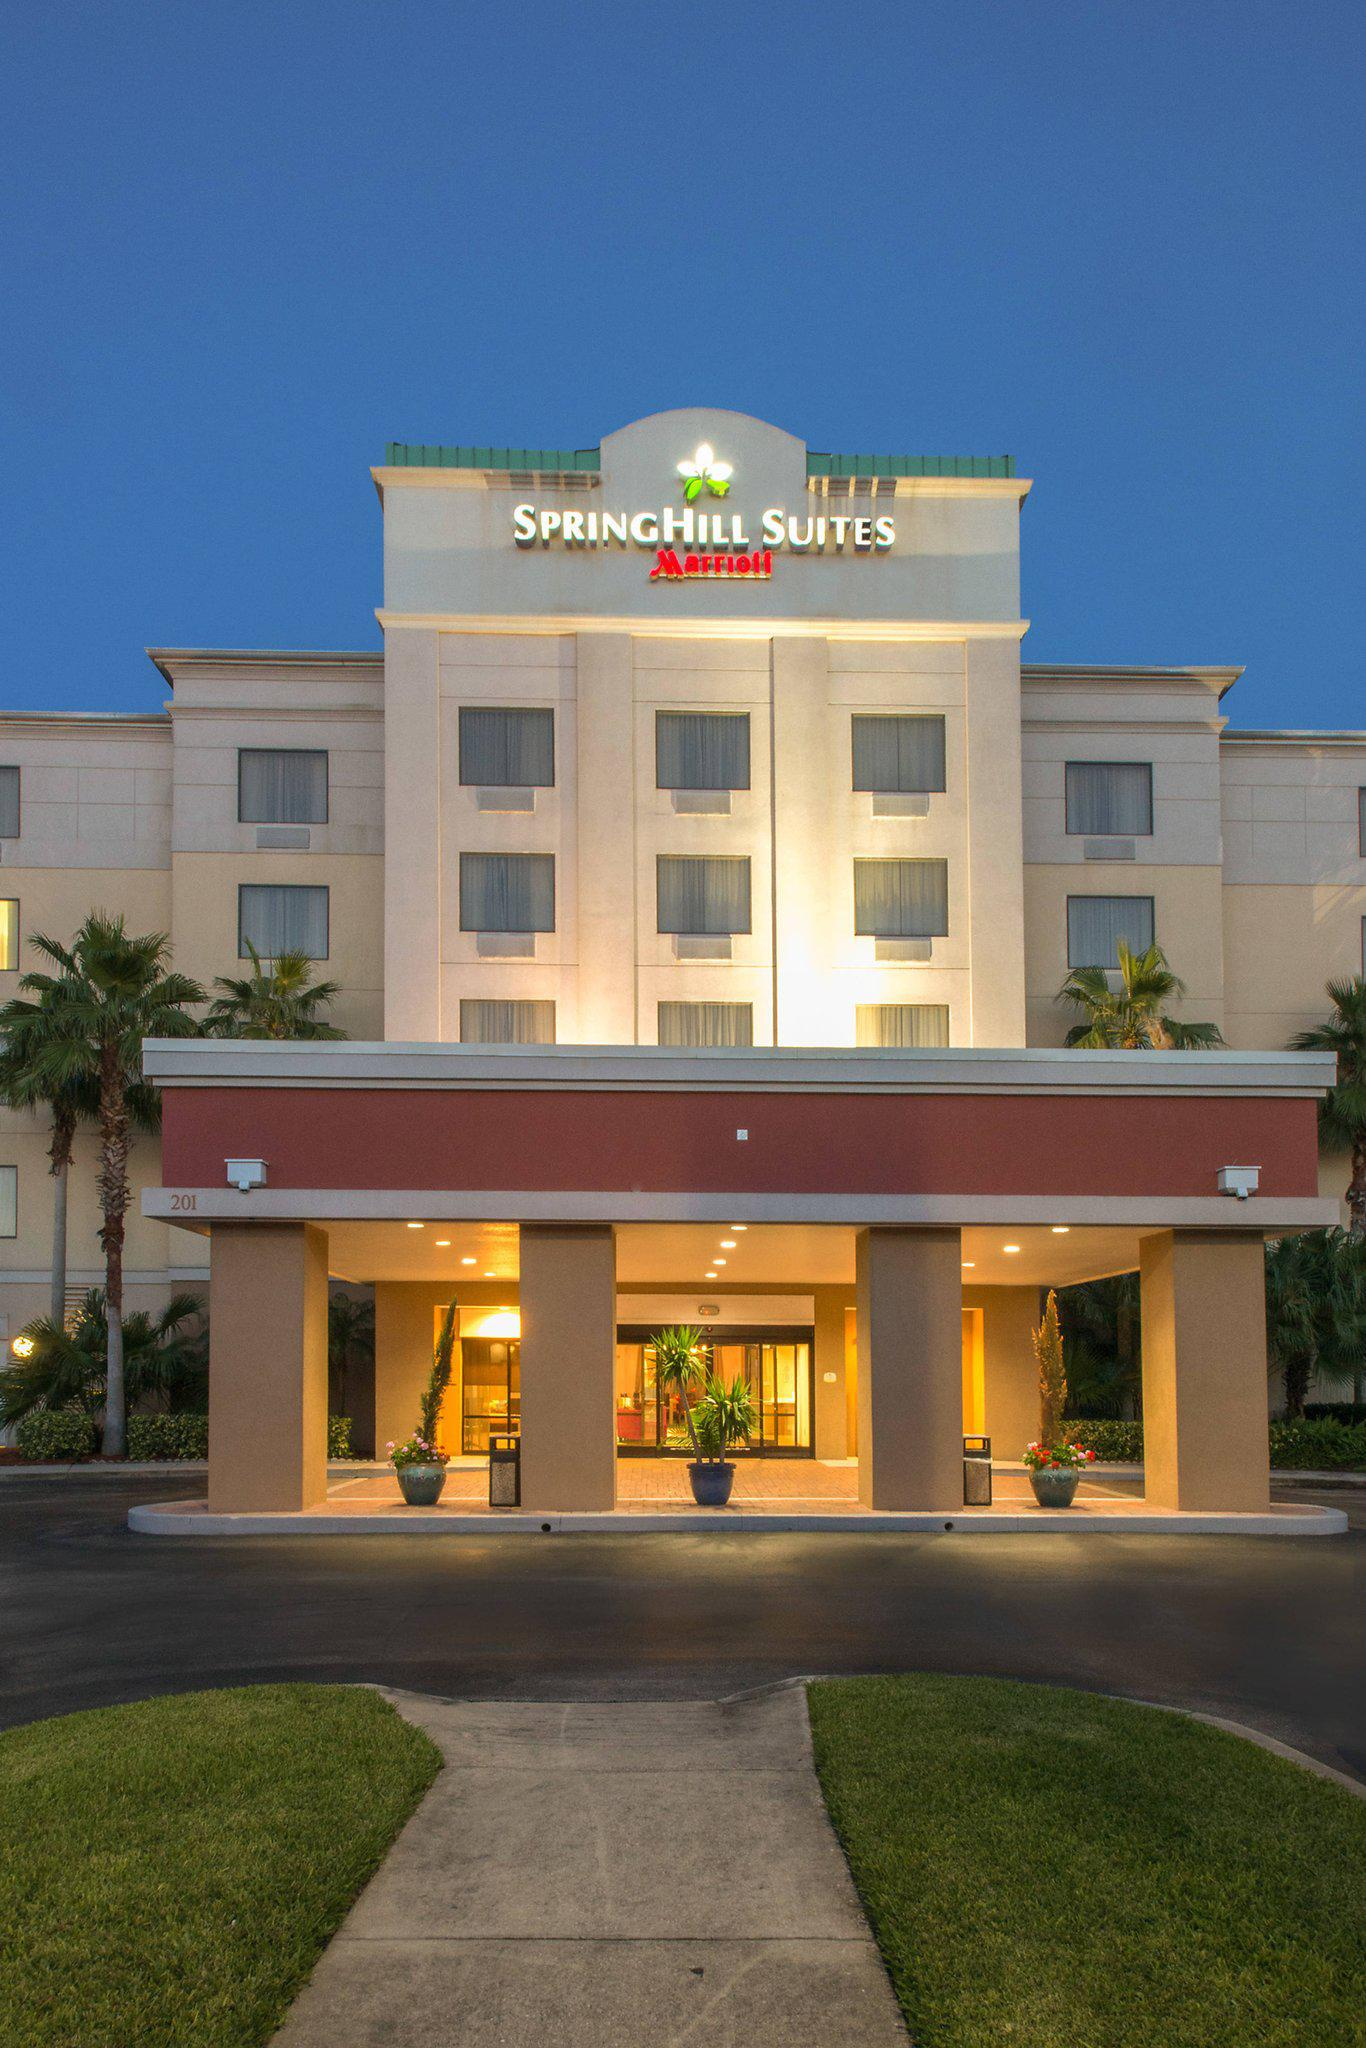 SpringHill Suites by Marriott Orlando North/Sanford